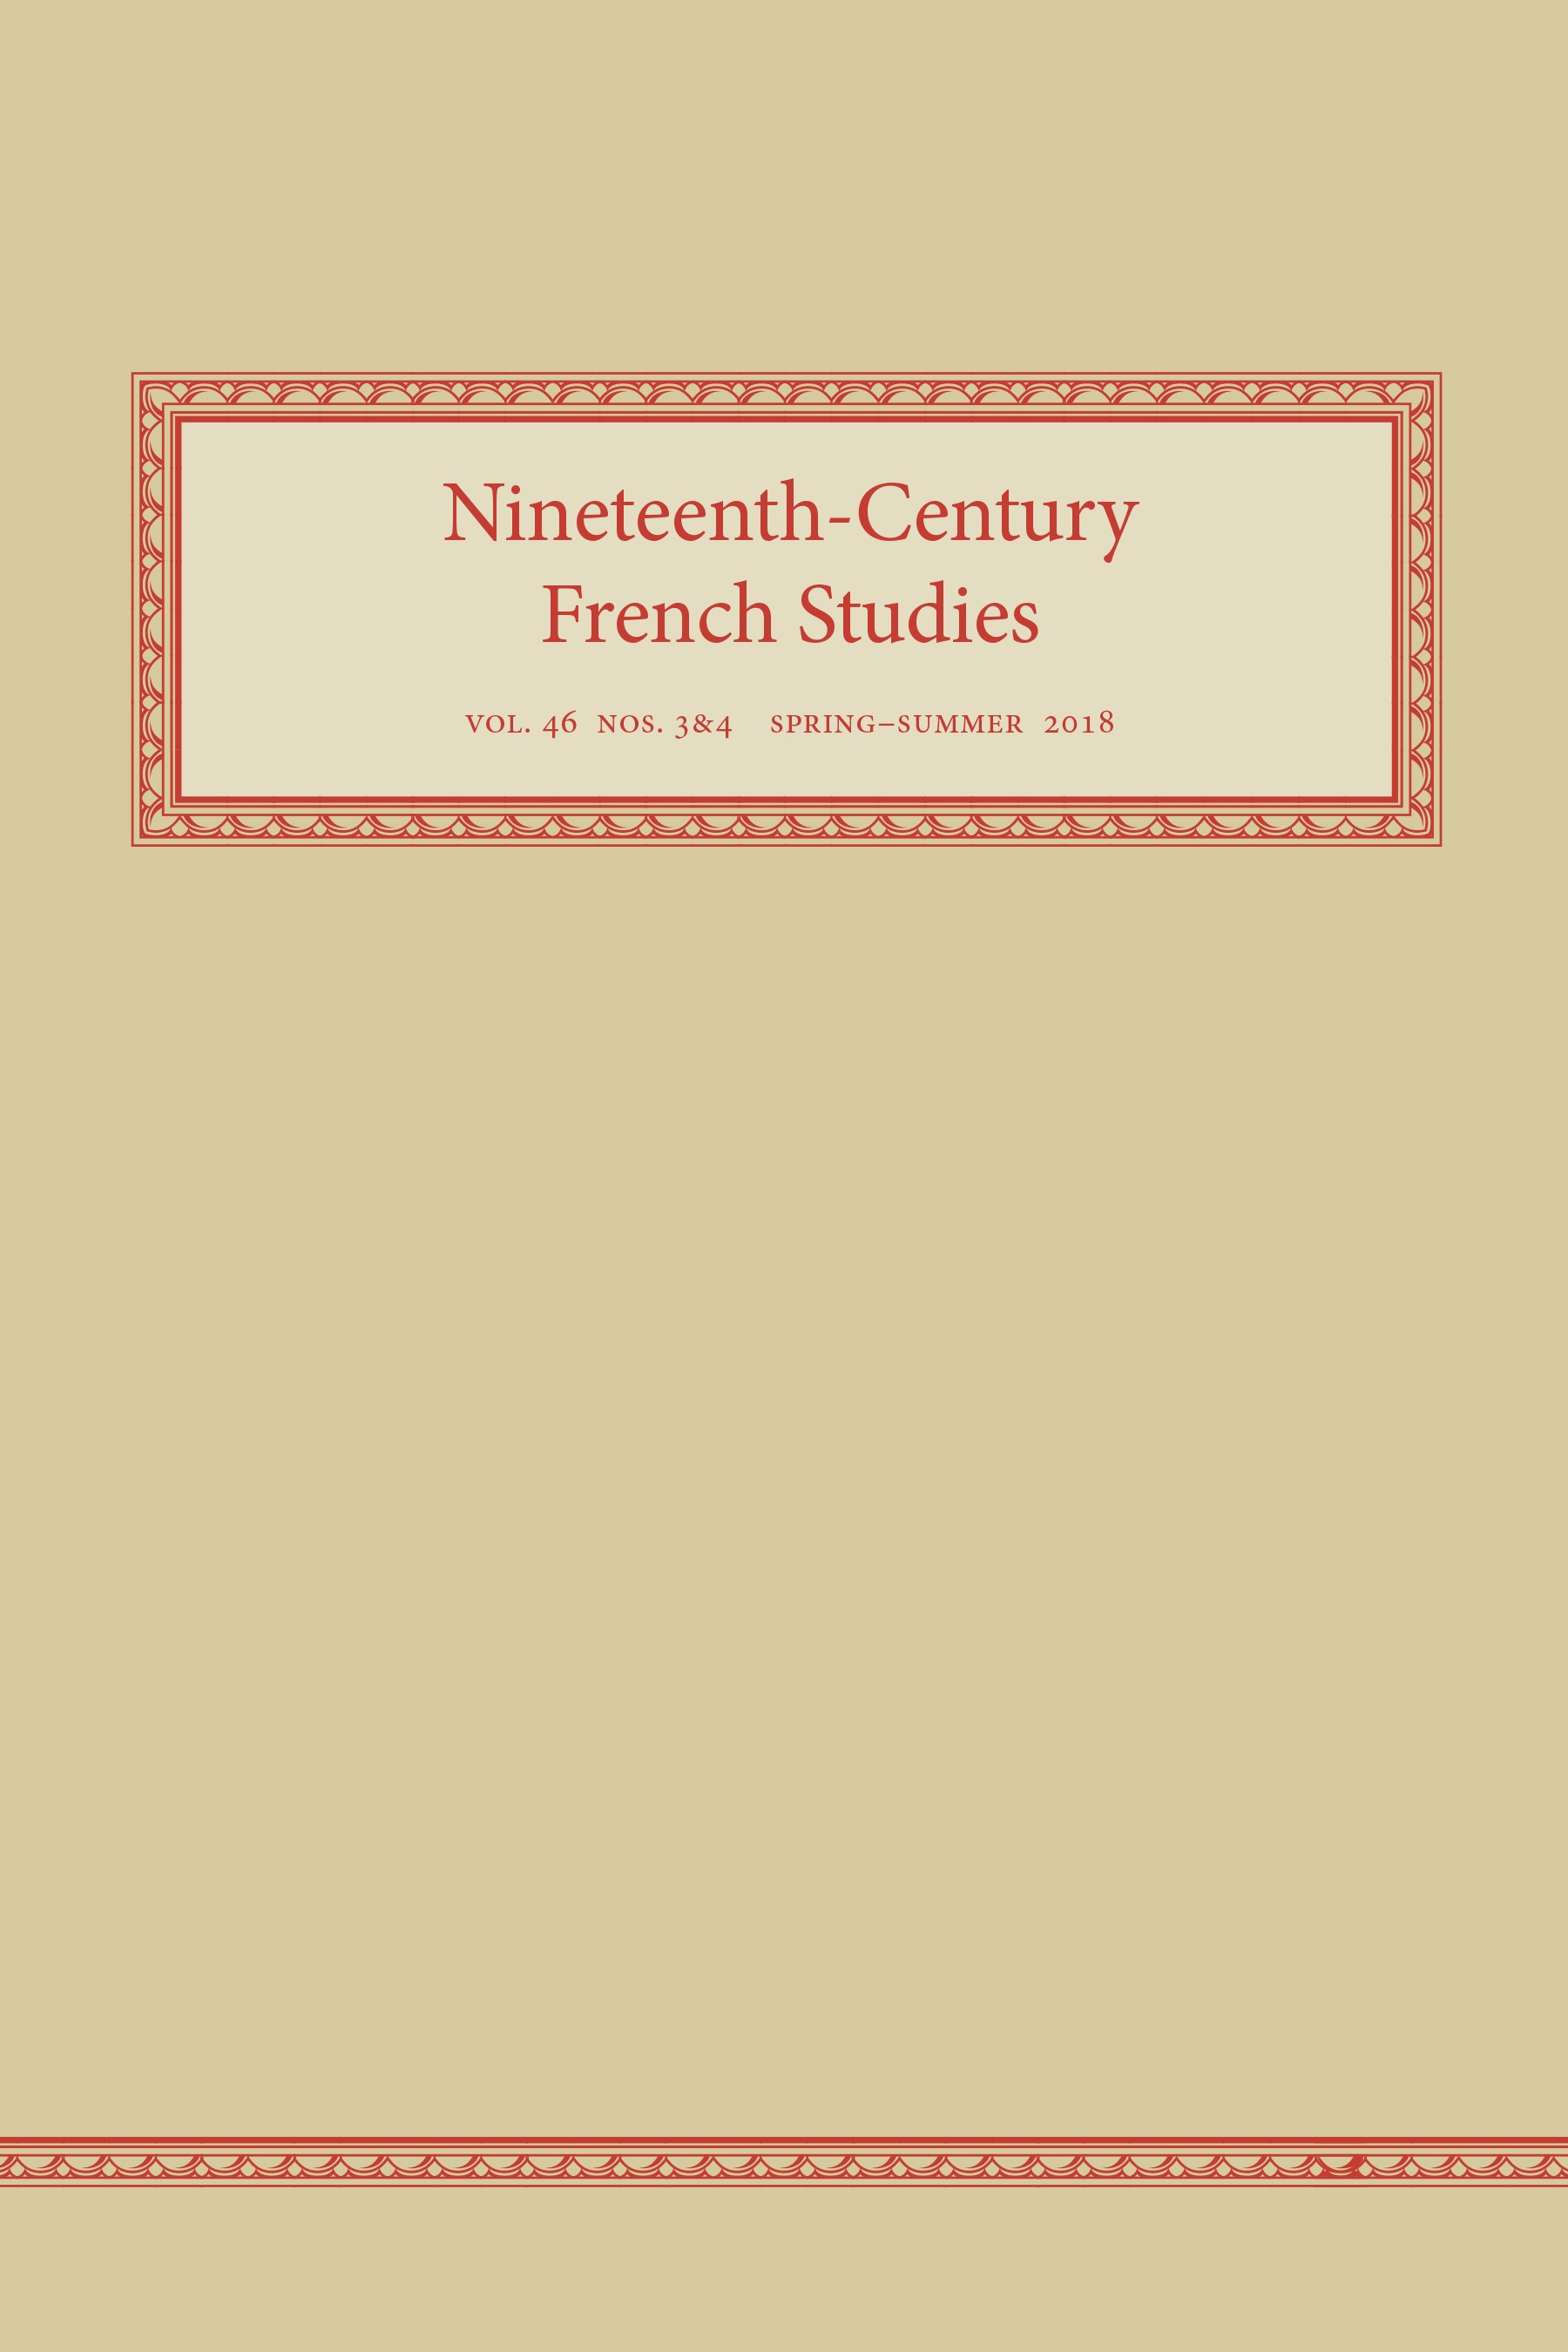 <em>Nineteenth-Century French Studies</em> 46.3–4 (Spring–Summer 2018)